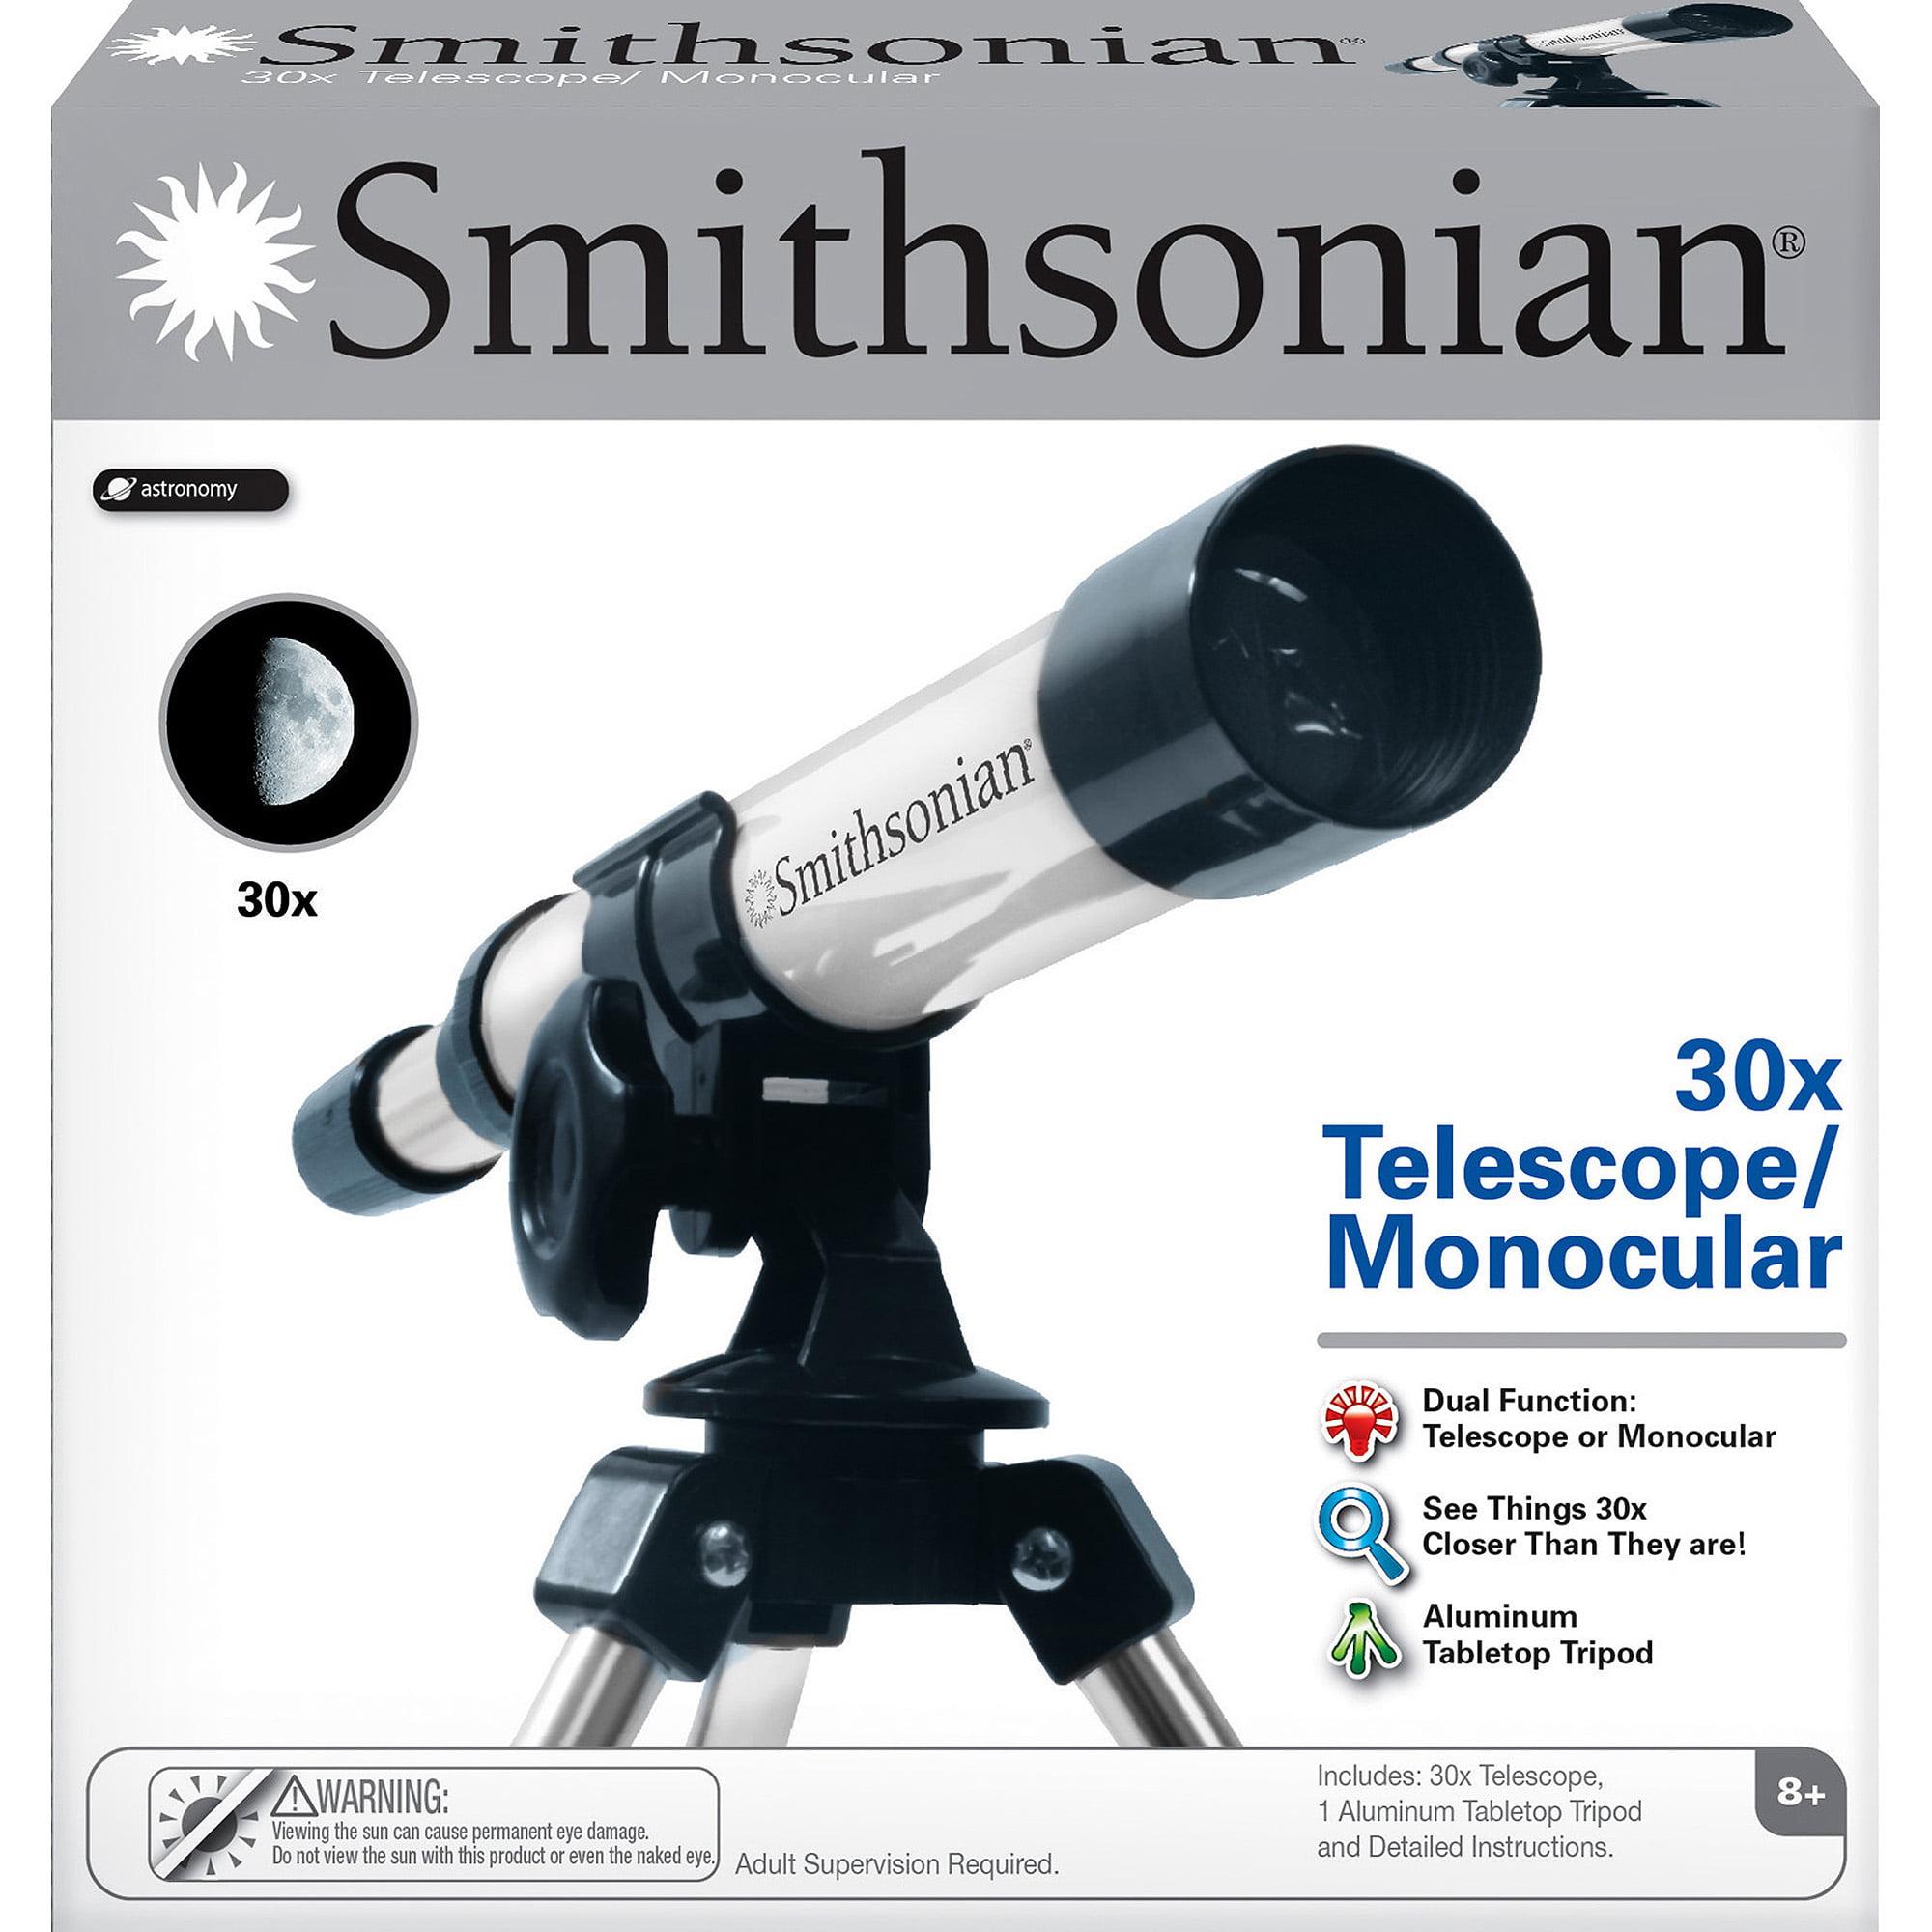 Smithsonian 30X Telescope Monocular Kit by NSI